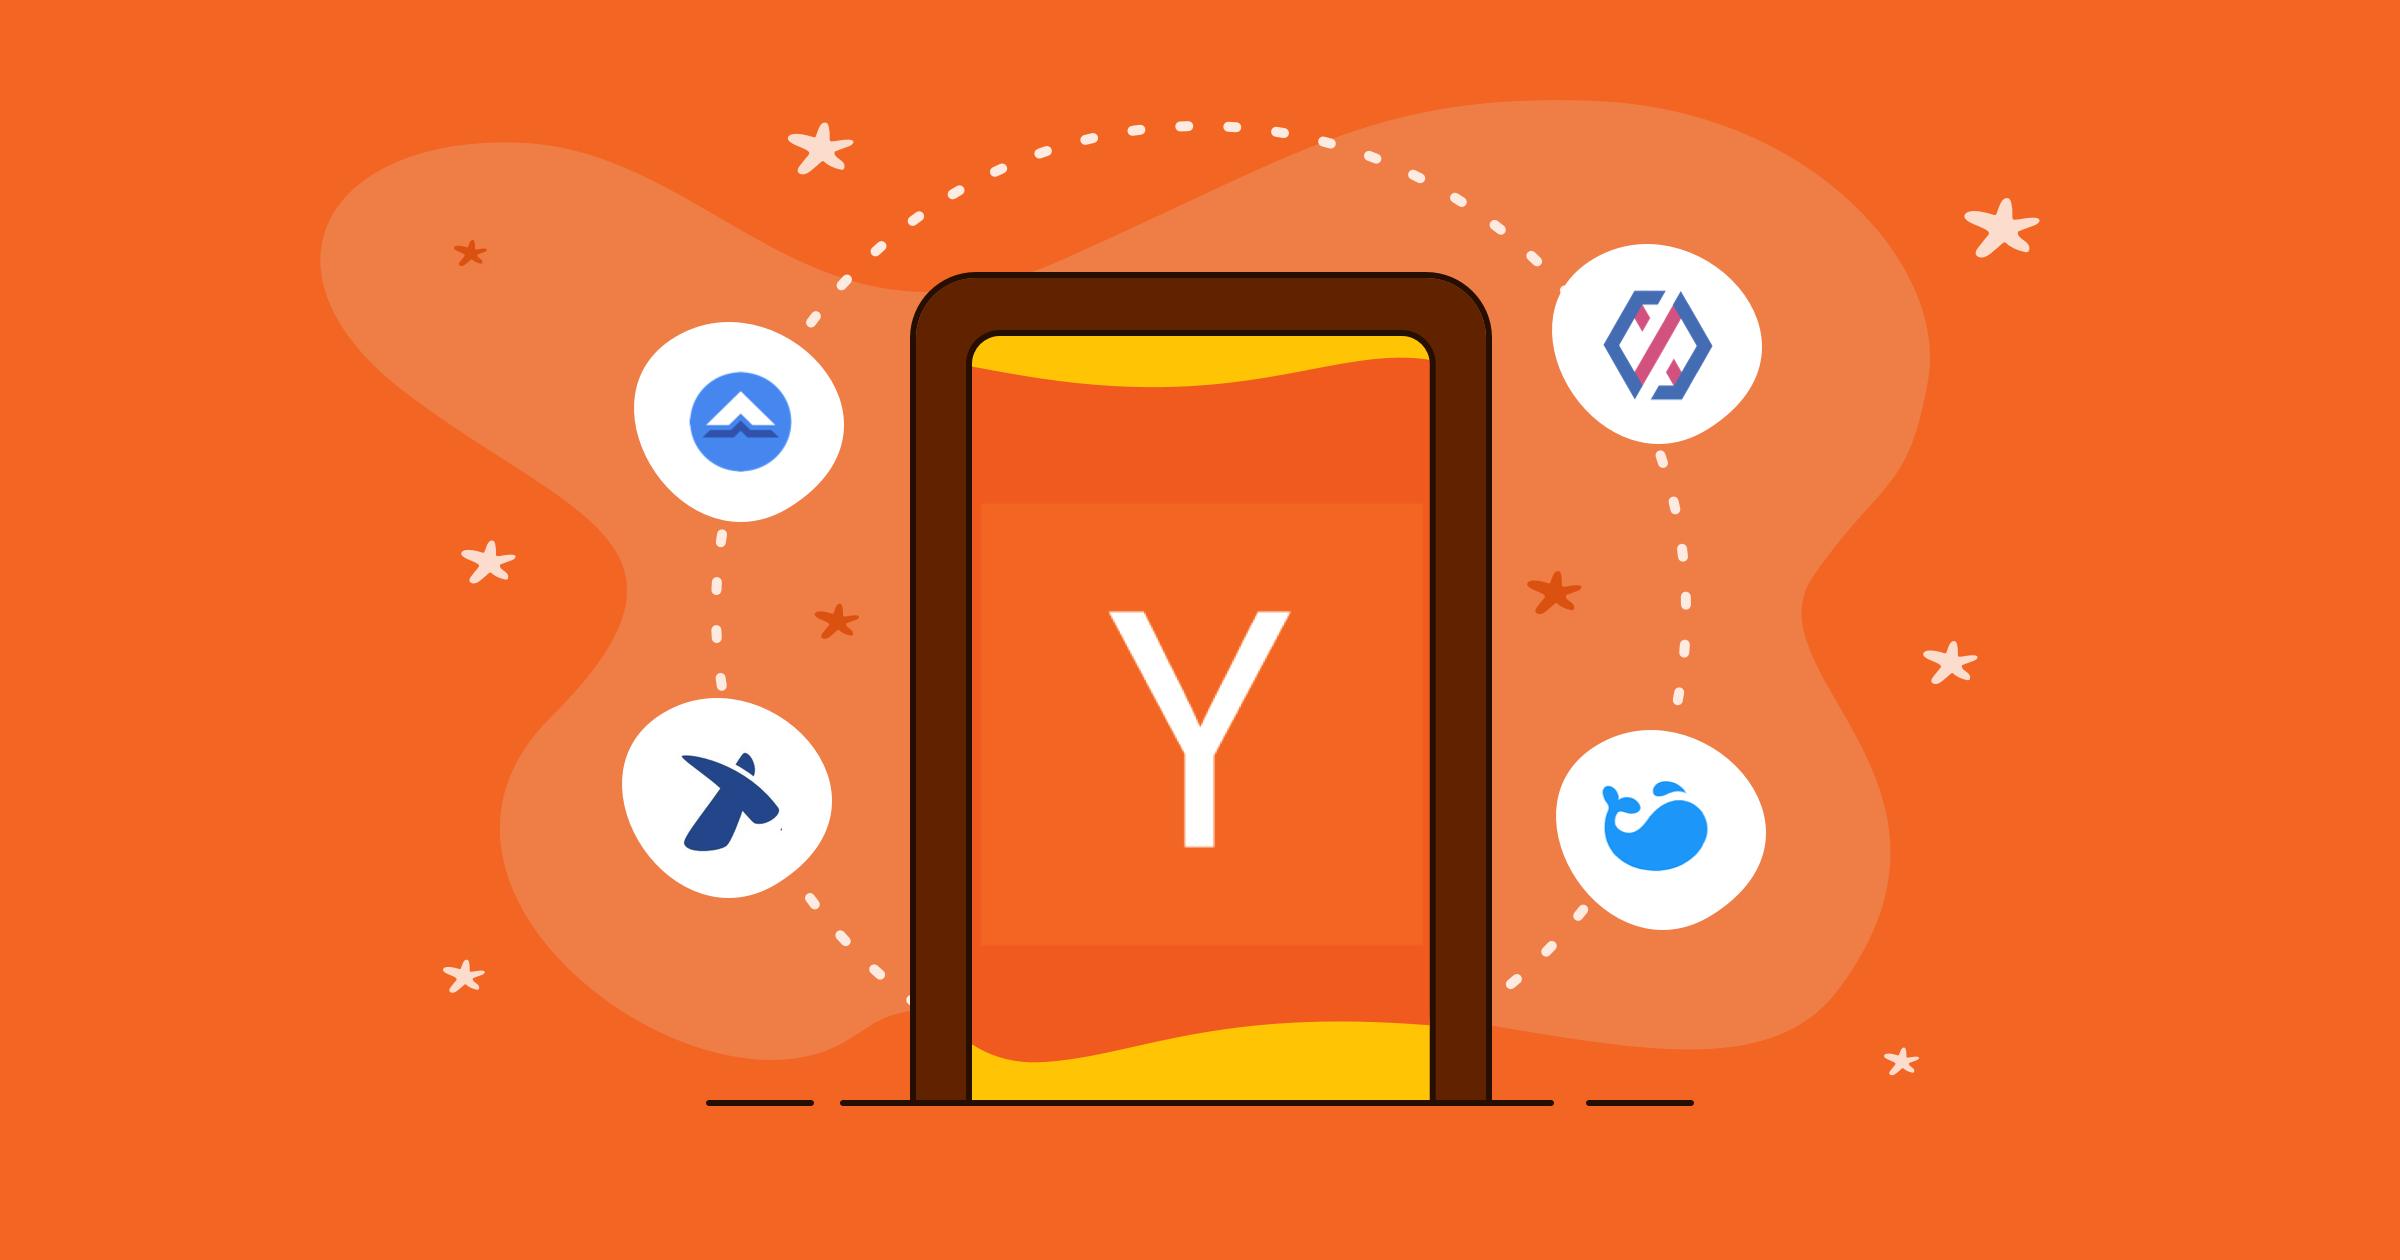 Ukraїnśkyj startap AxDraft otrymav $150 tysjač vid Y Combinator